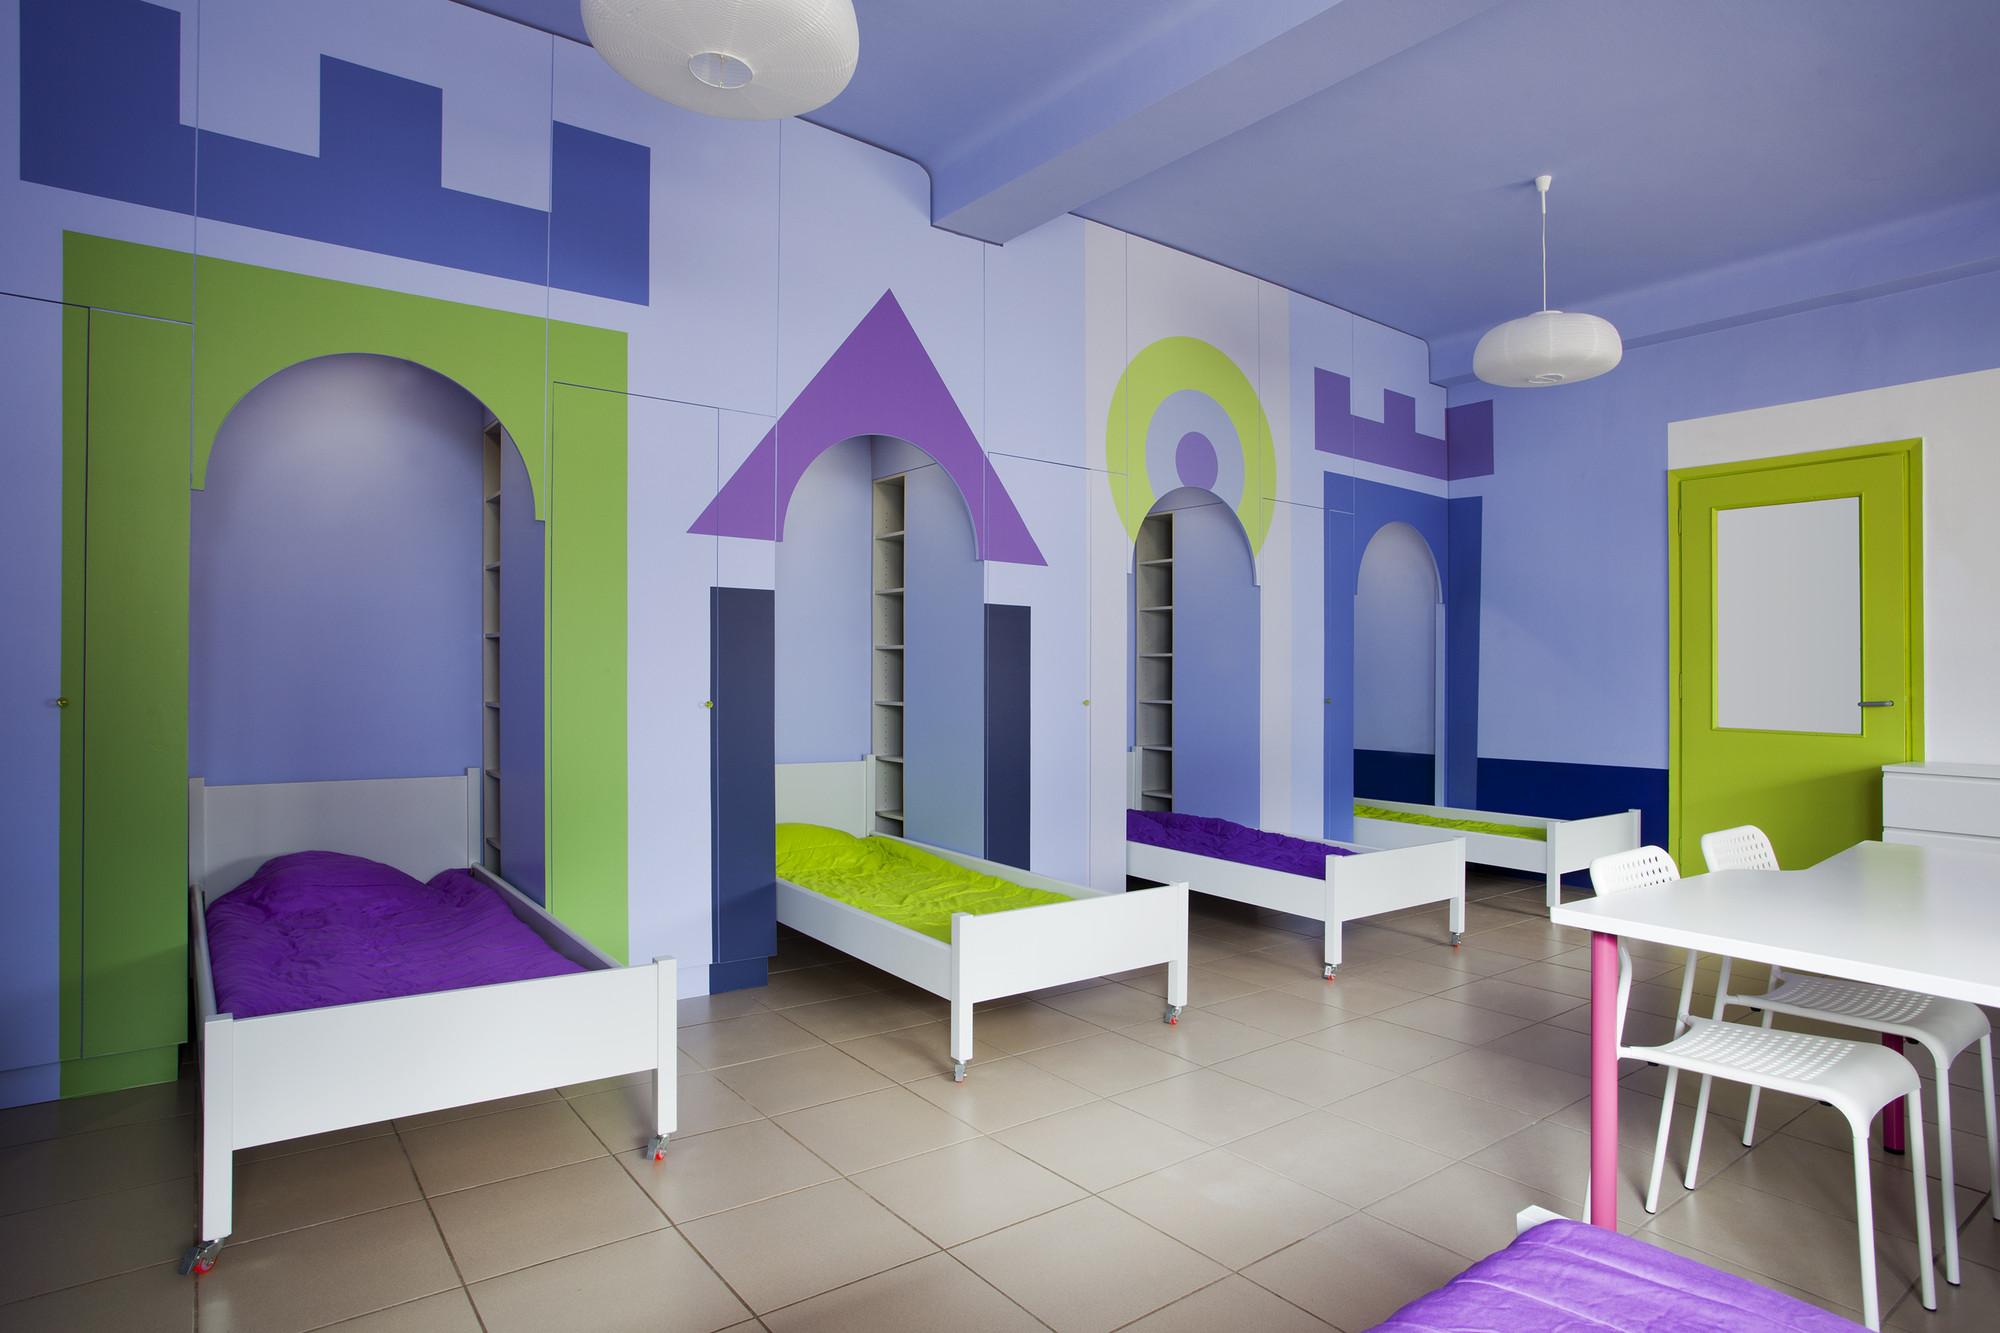 Big Smile Project / Schema Architecture & Engineering, © Nikos Alexopoulos